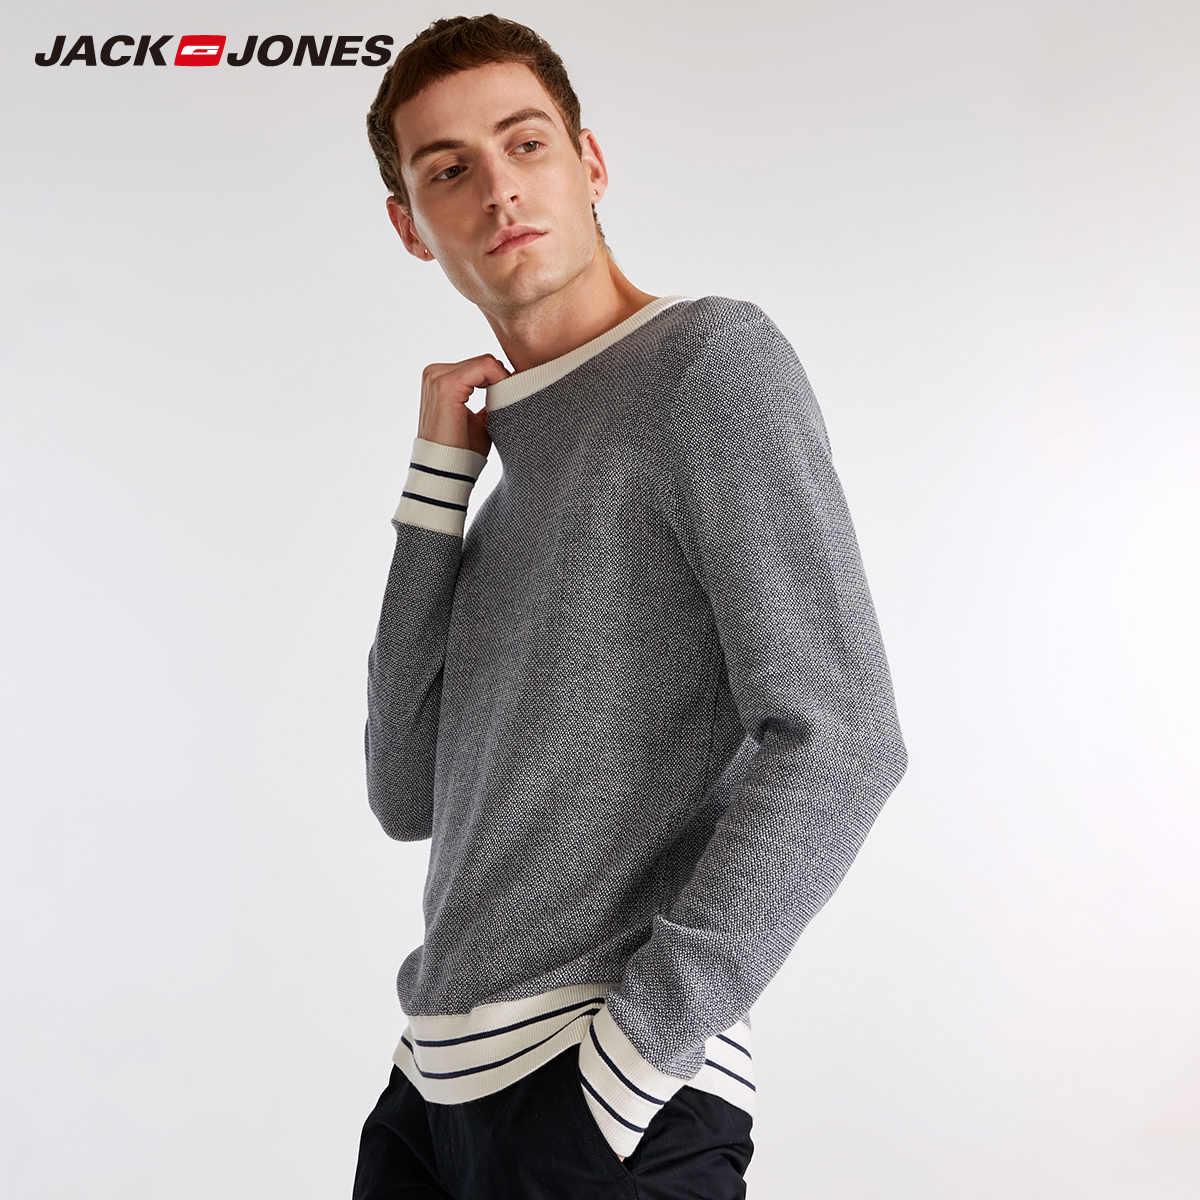 JackJones Männer der Herbst 100% Baumwolle Pullover Gestrickte Top Casual Pullover männer Slim Fit Marke Gestrickte Pullover 218324509